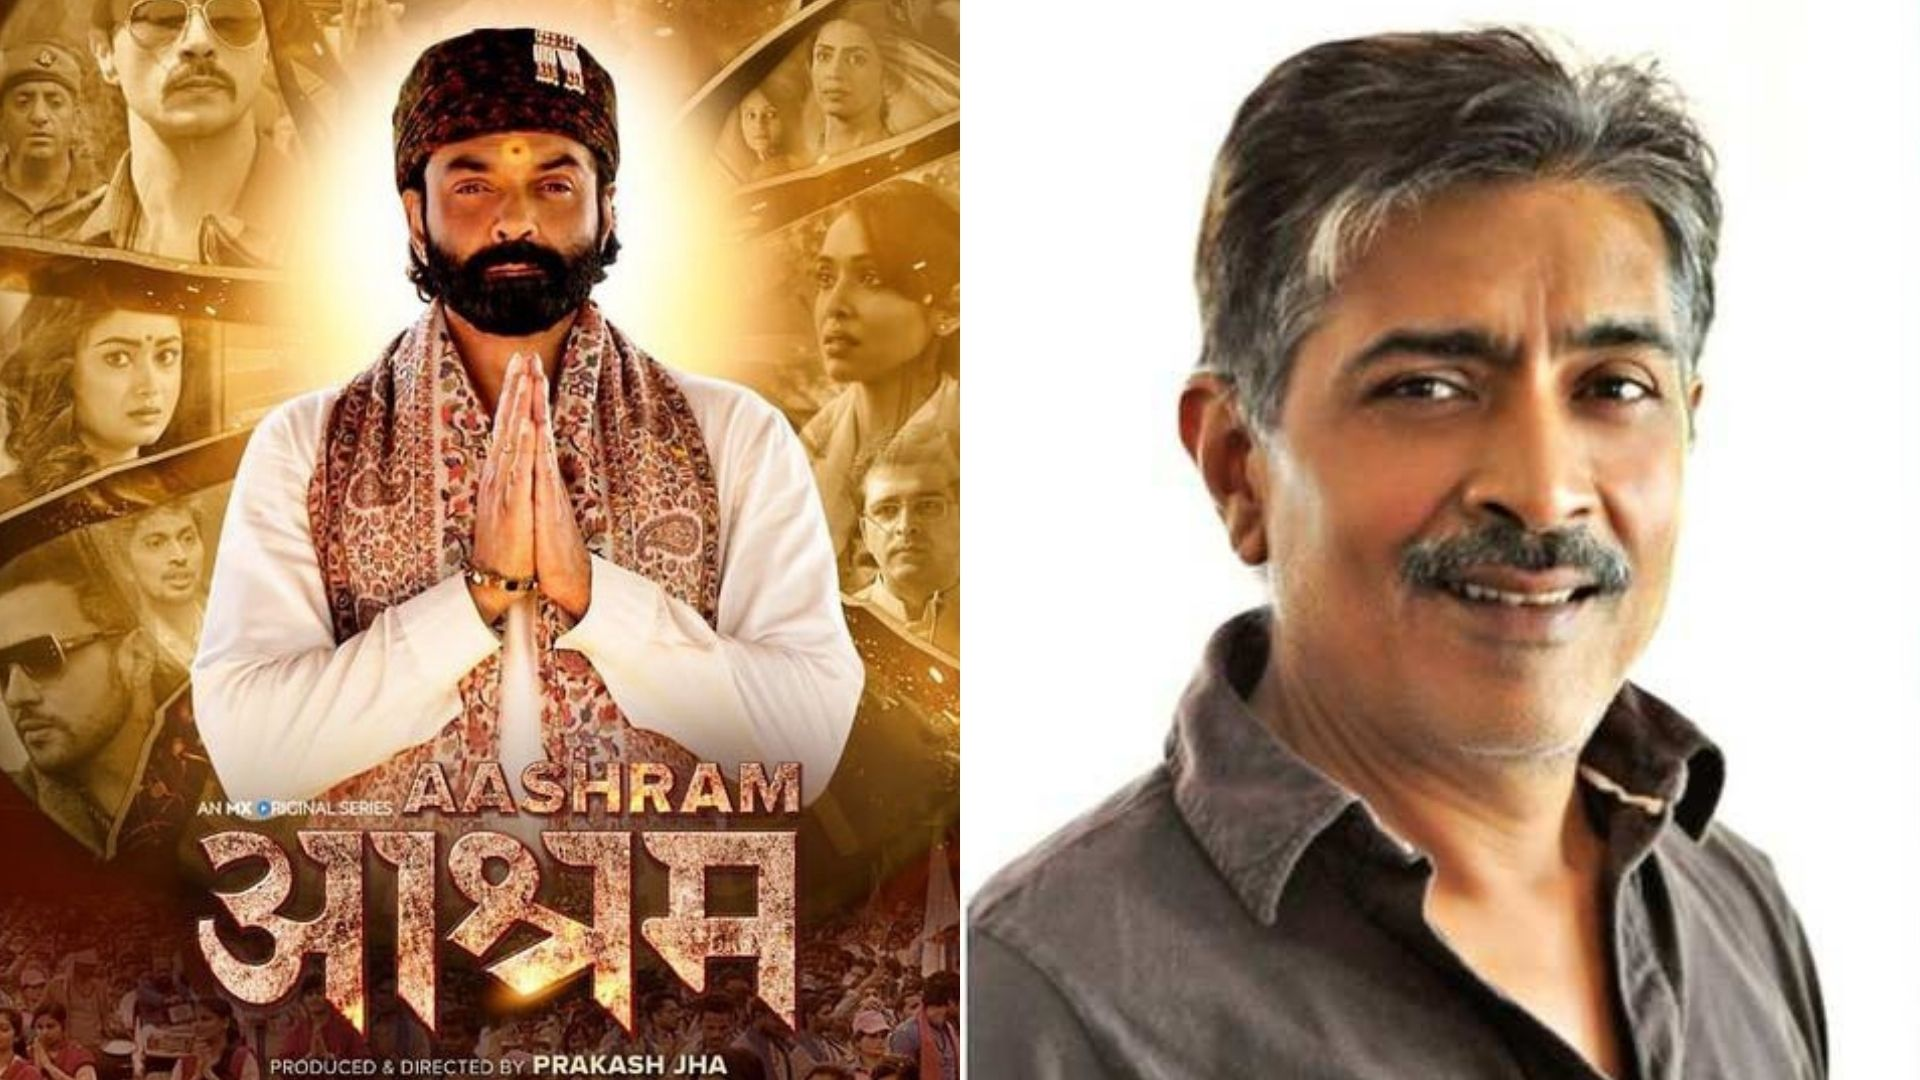 Bajrang Dal Activists Vandalise The Sets Of Bobby Deol's Upcoming Digital Show; Ink Thrown On Prakash Jha – REPORTS